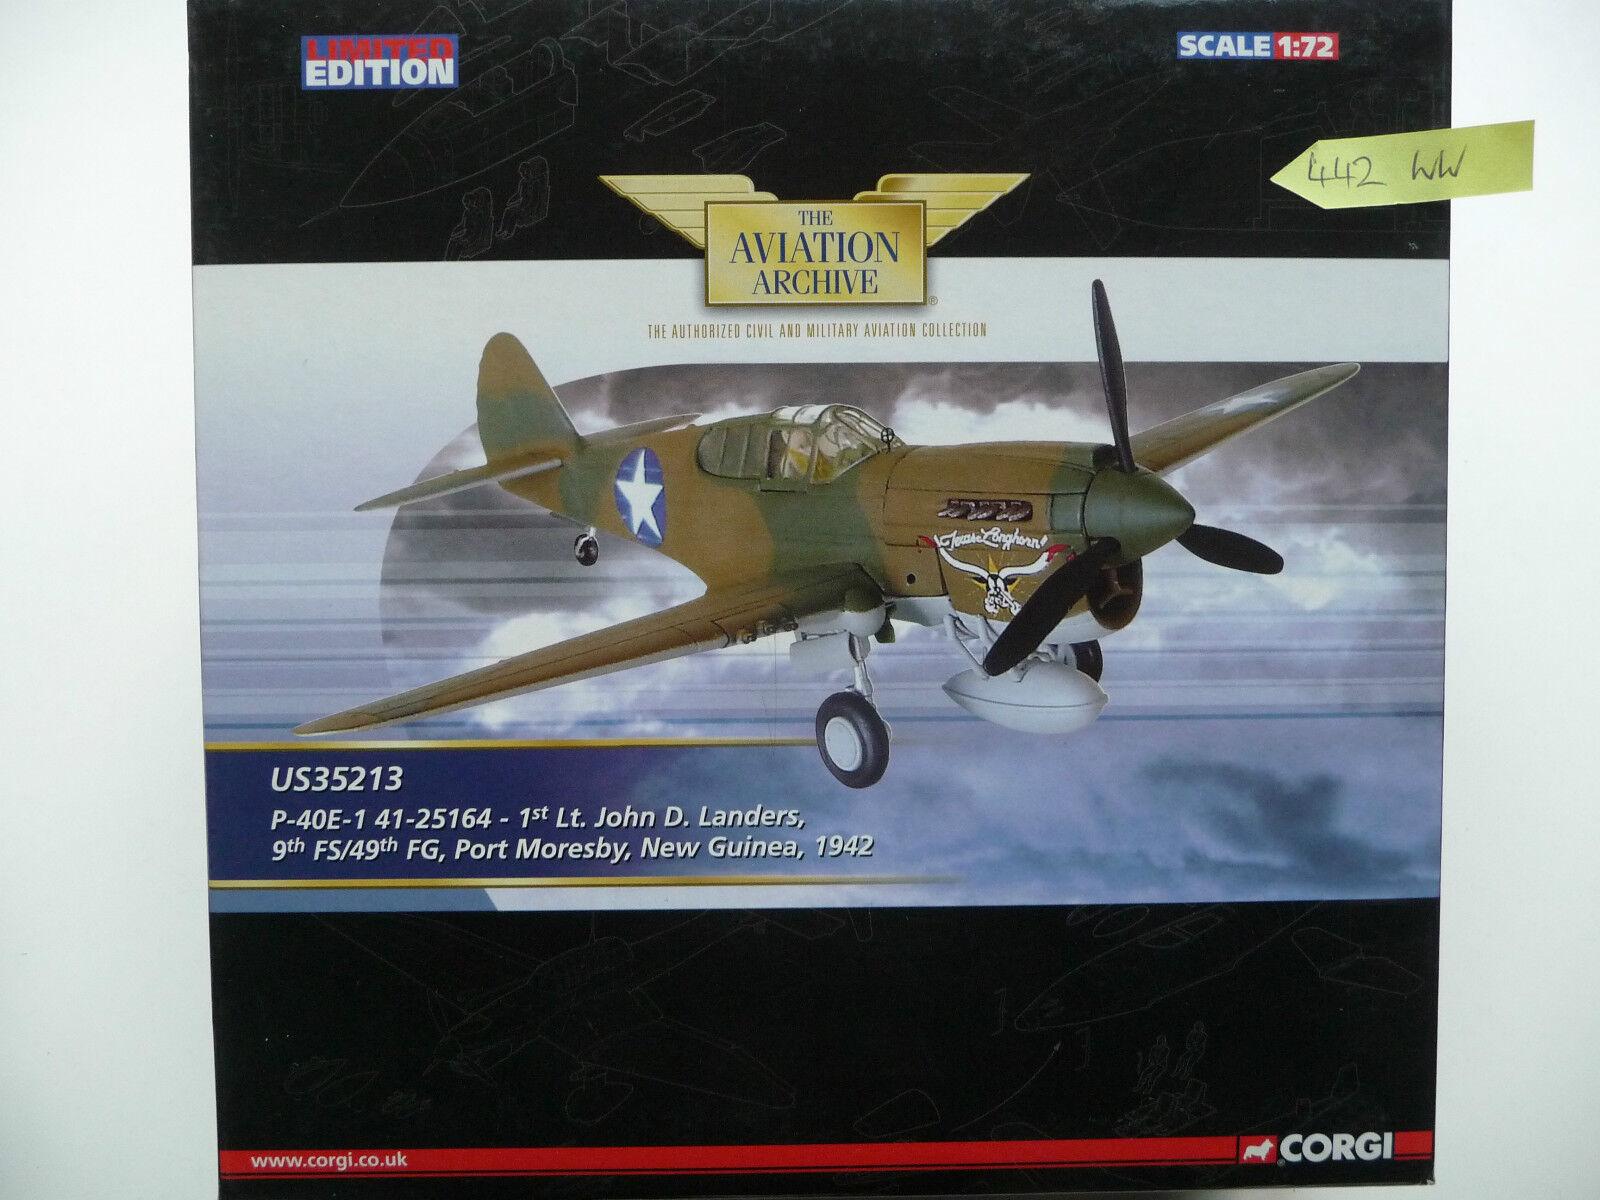 Corgi Aviation US35213 P-40E-1 41-25164 Lt. John D Landers, 9th FS 49th FG. MIB.